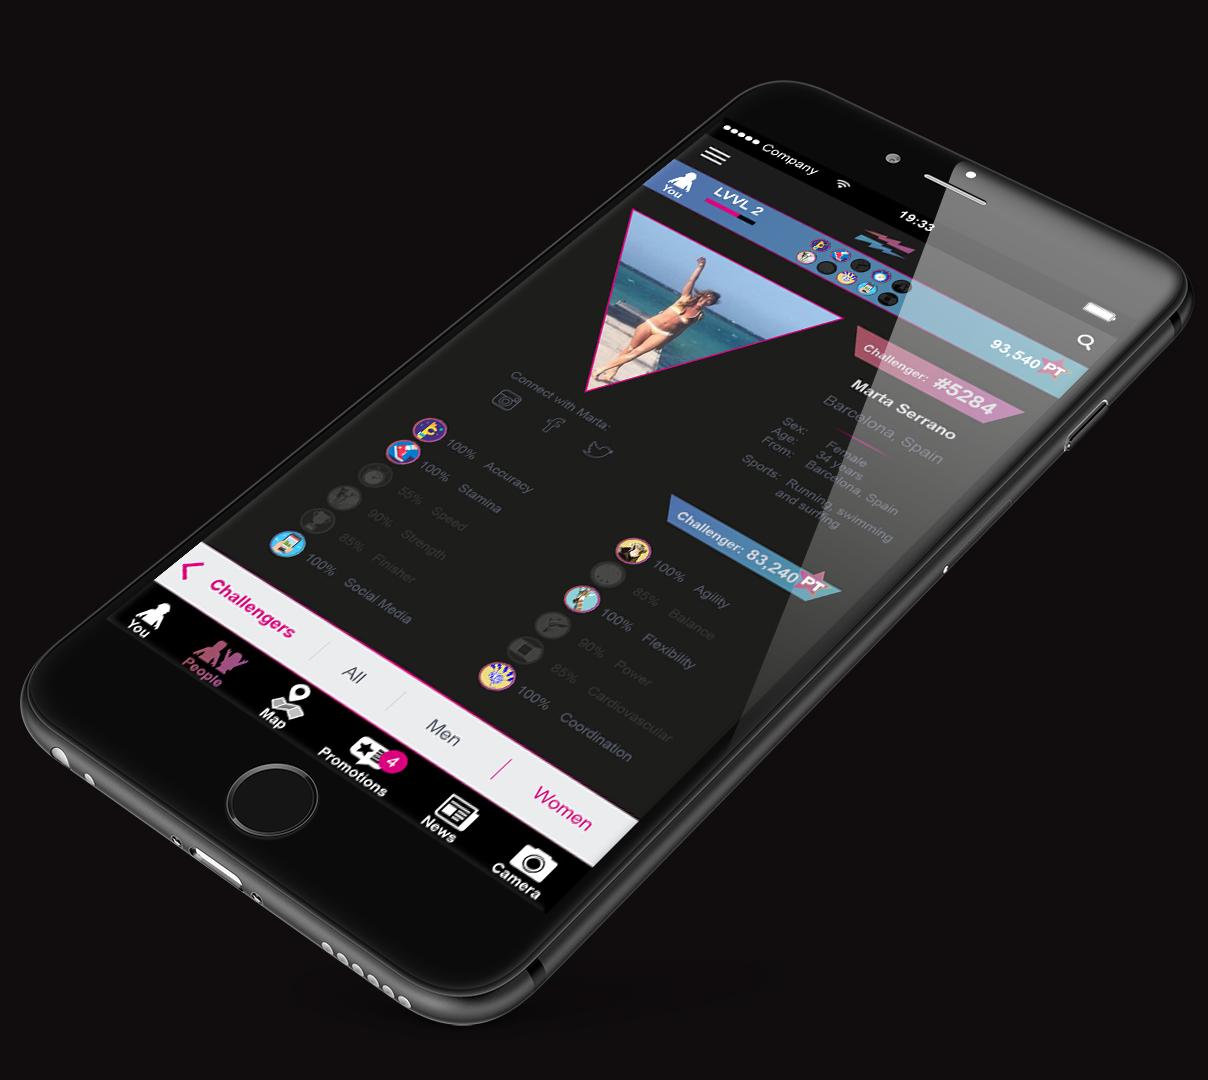 LEVVEL iPhone_Plus_app_challenges_challengers Marta.jpg